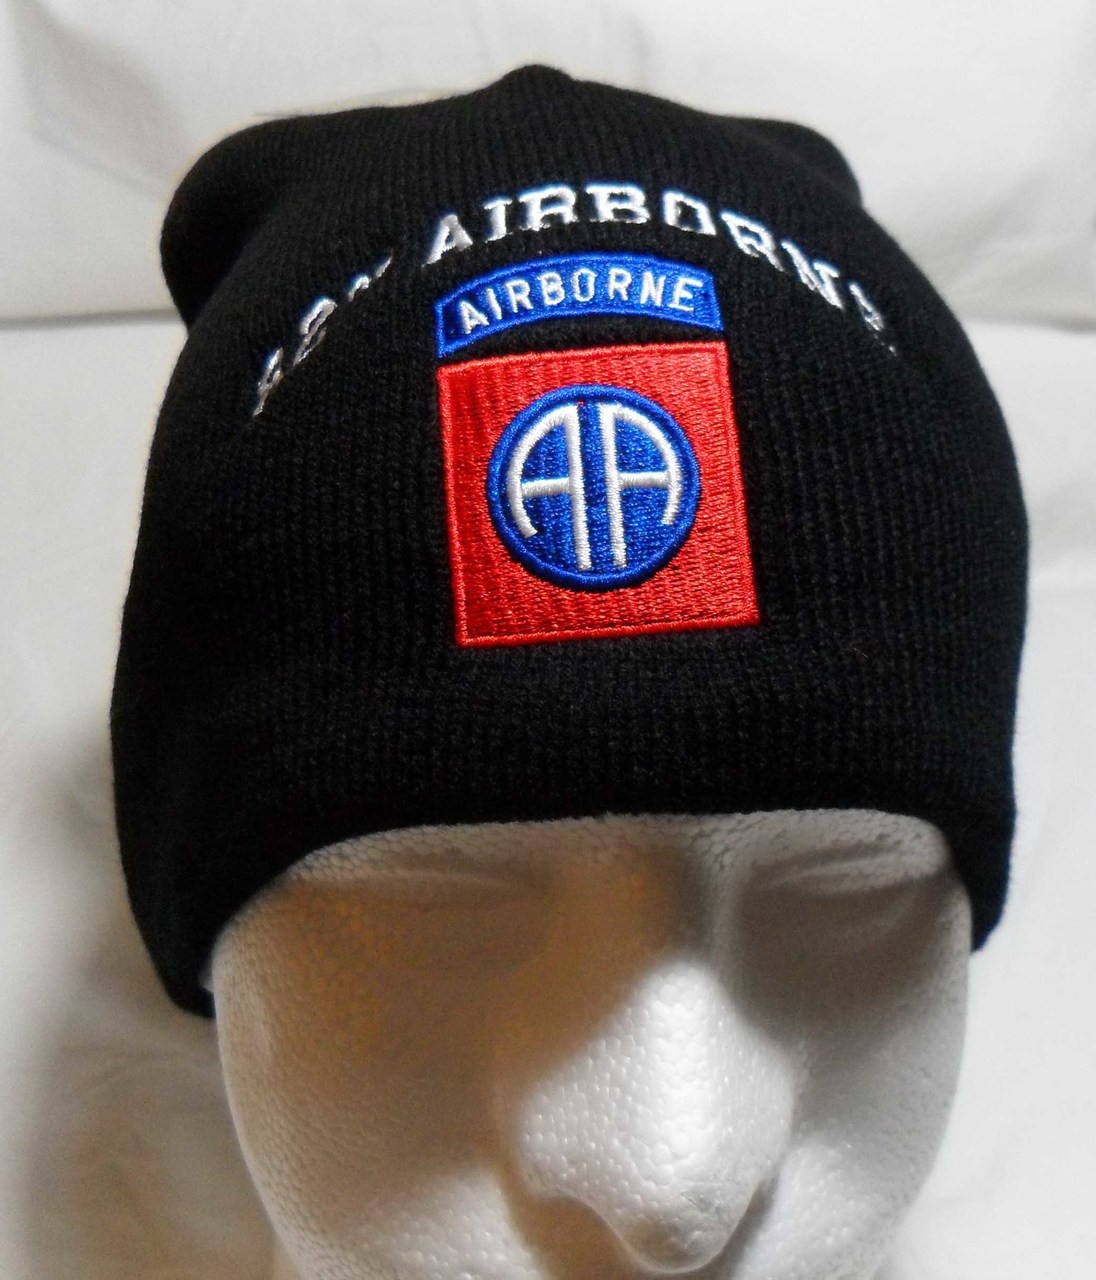 562145a4eaf 82nd AIRBORNE Watch Cap Beanie Winter Ski Hat Toboggan Officially Licensed